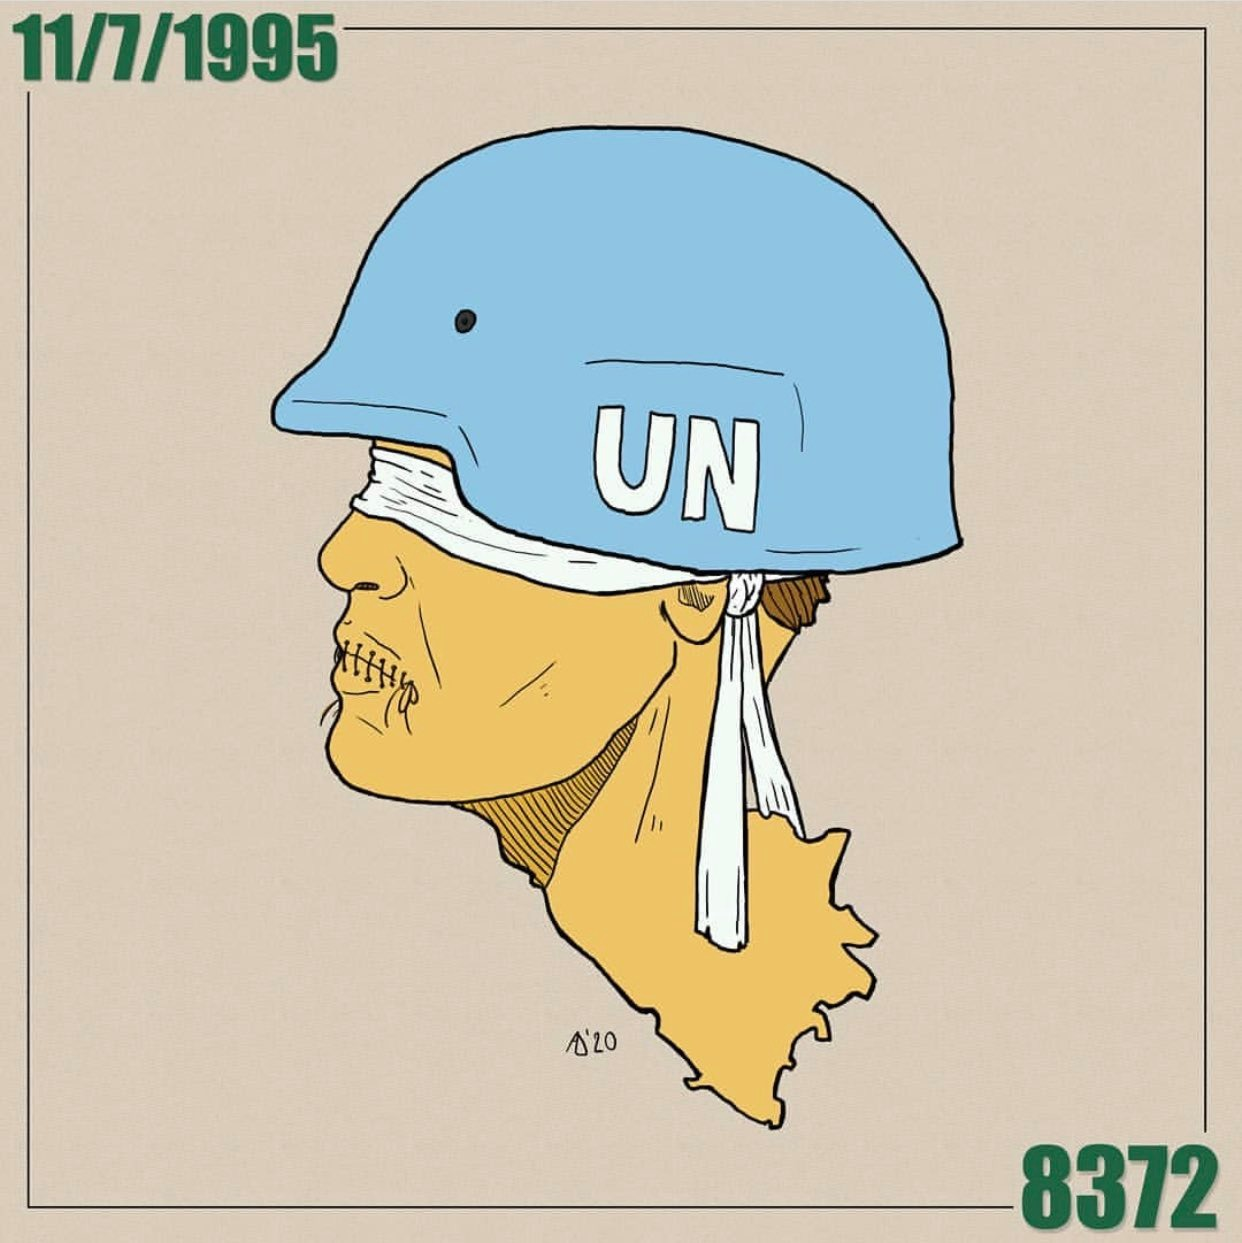 UN Srebrenica. Admir Delic/Al Jazeera